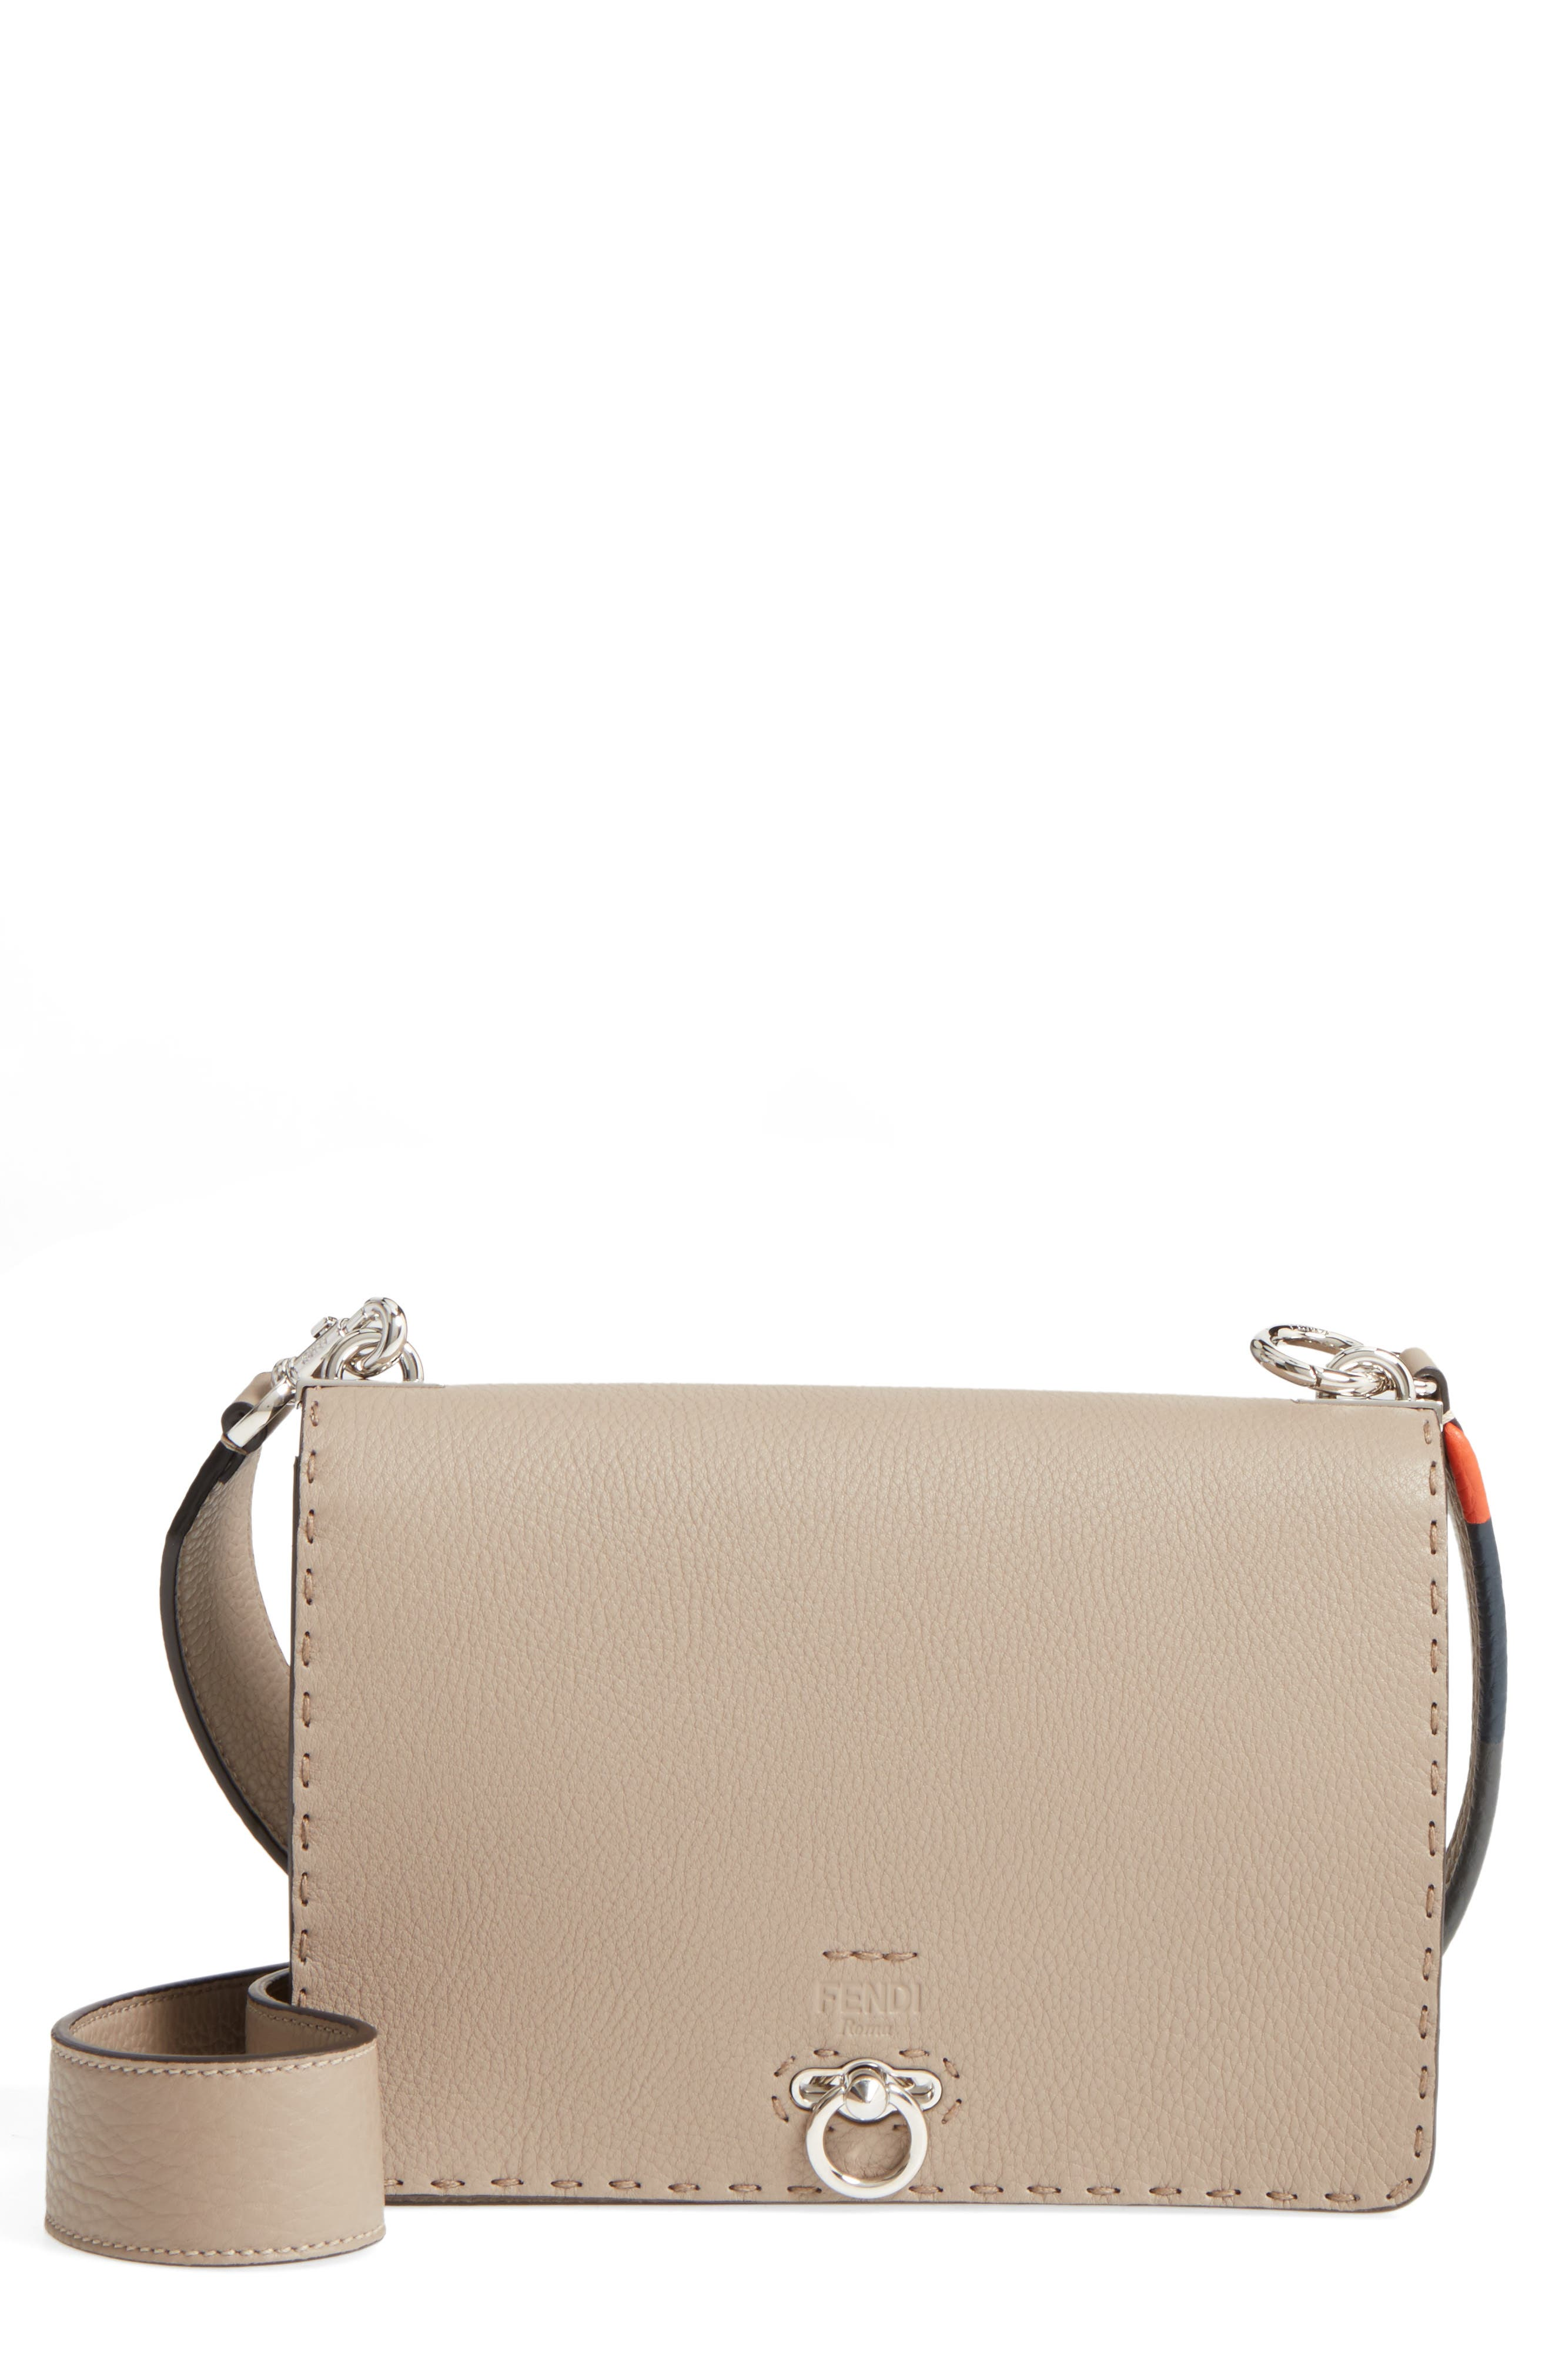 Pebbled Leather Messenger Bag,                             Main thumbnail 1, color,                             250